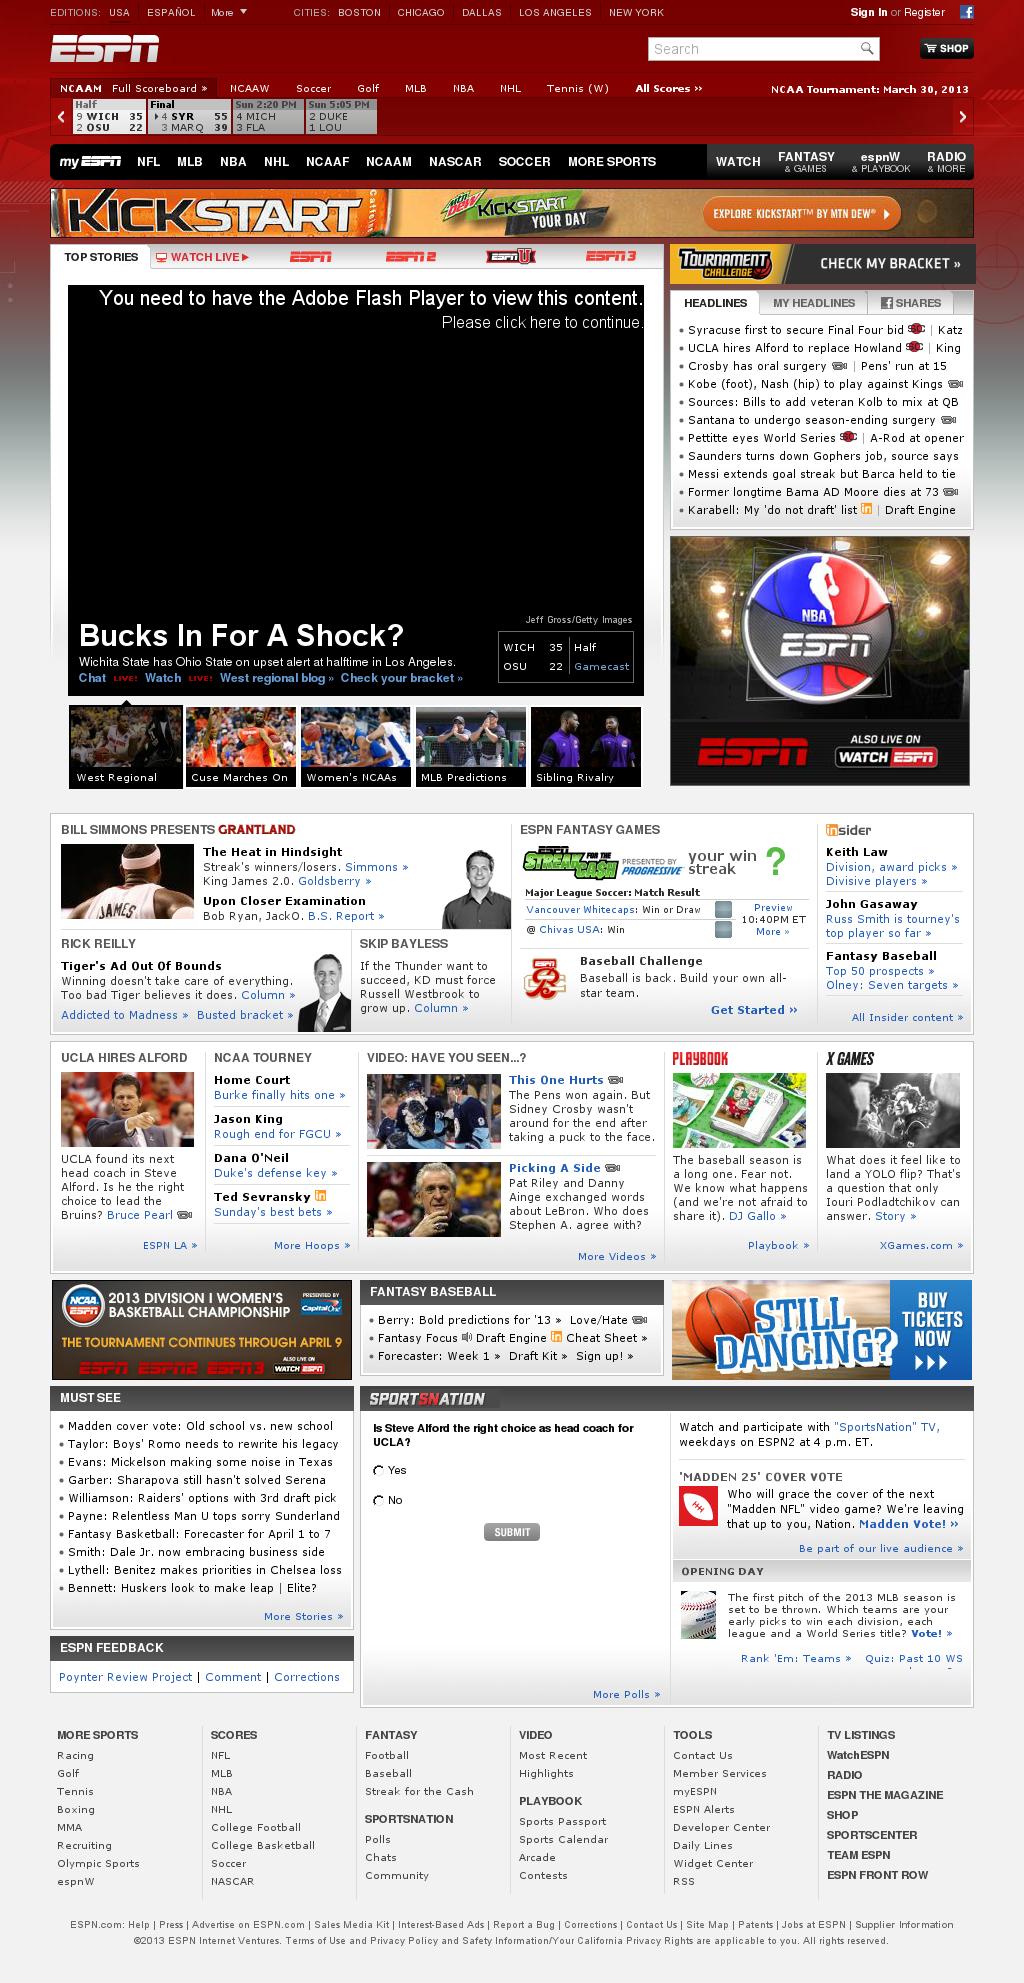 ESPN at Sunday March 31, 2013, 12:05 a.m. UTC